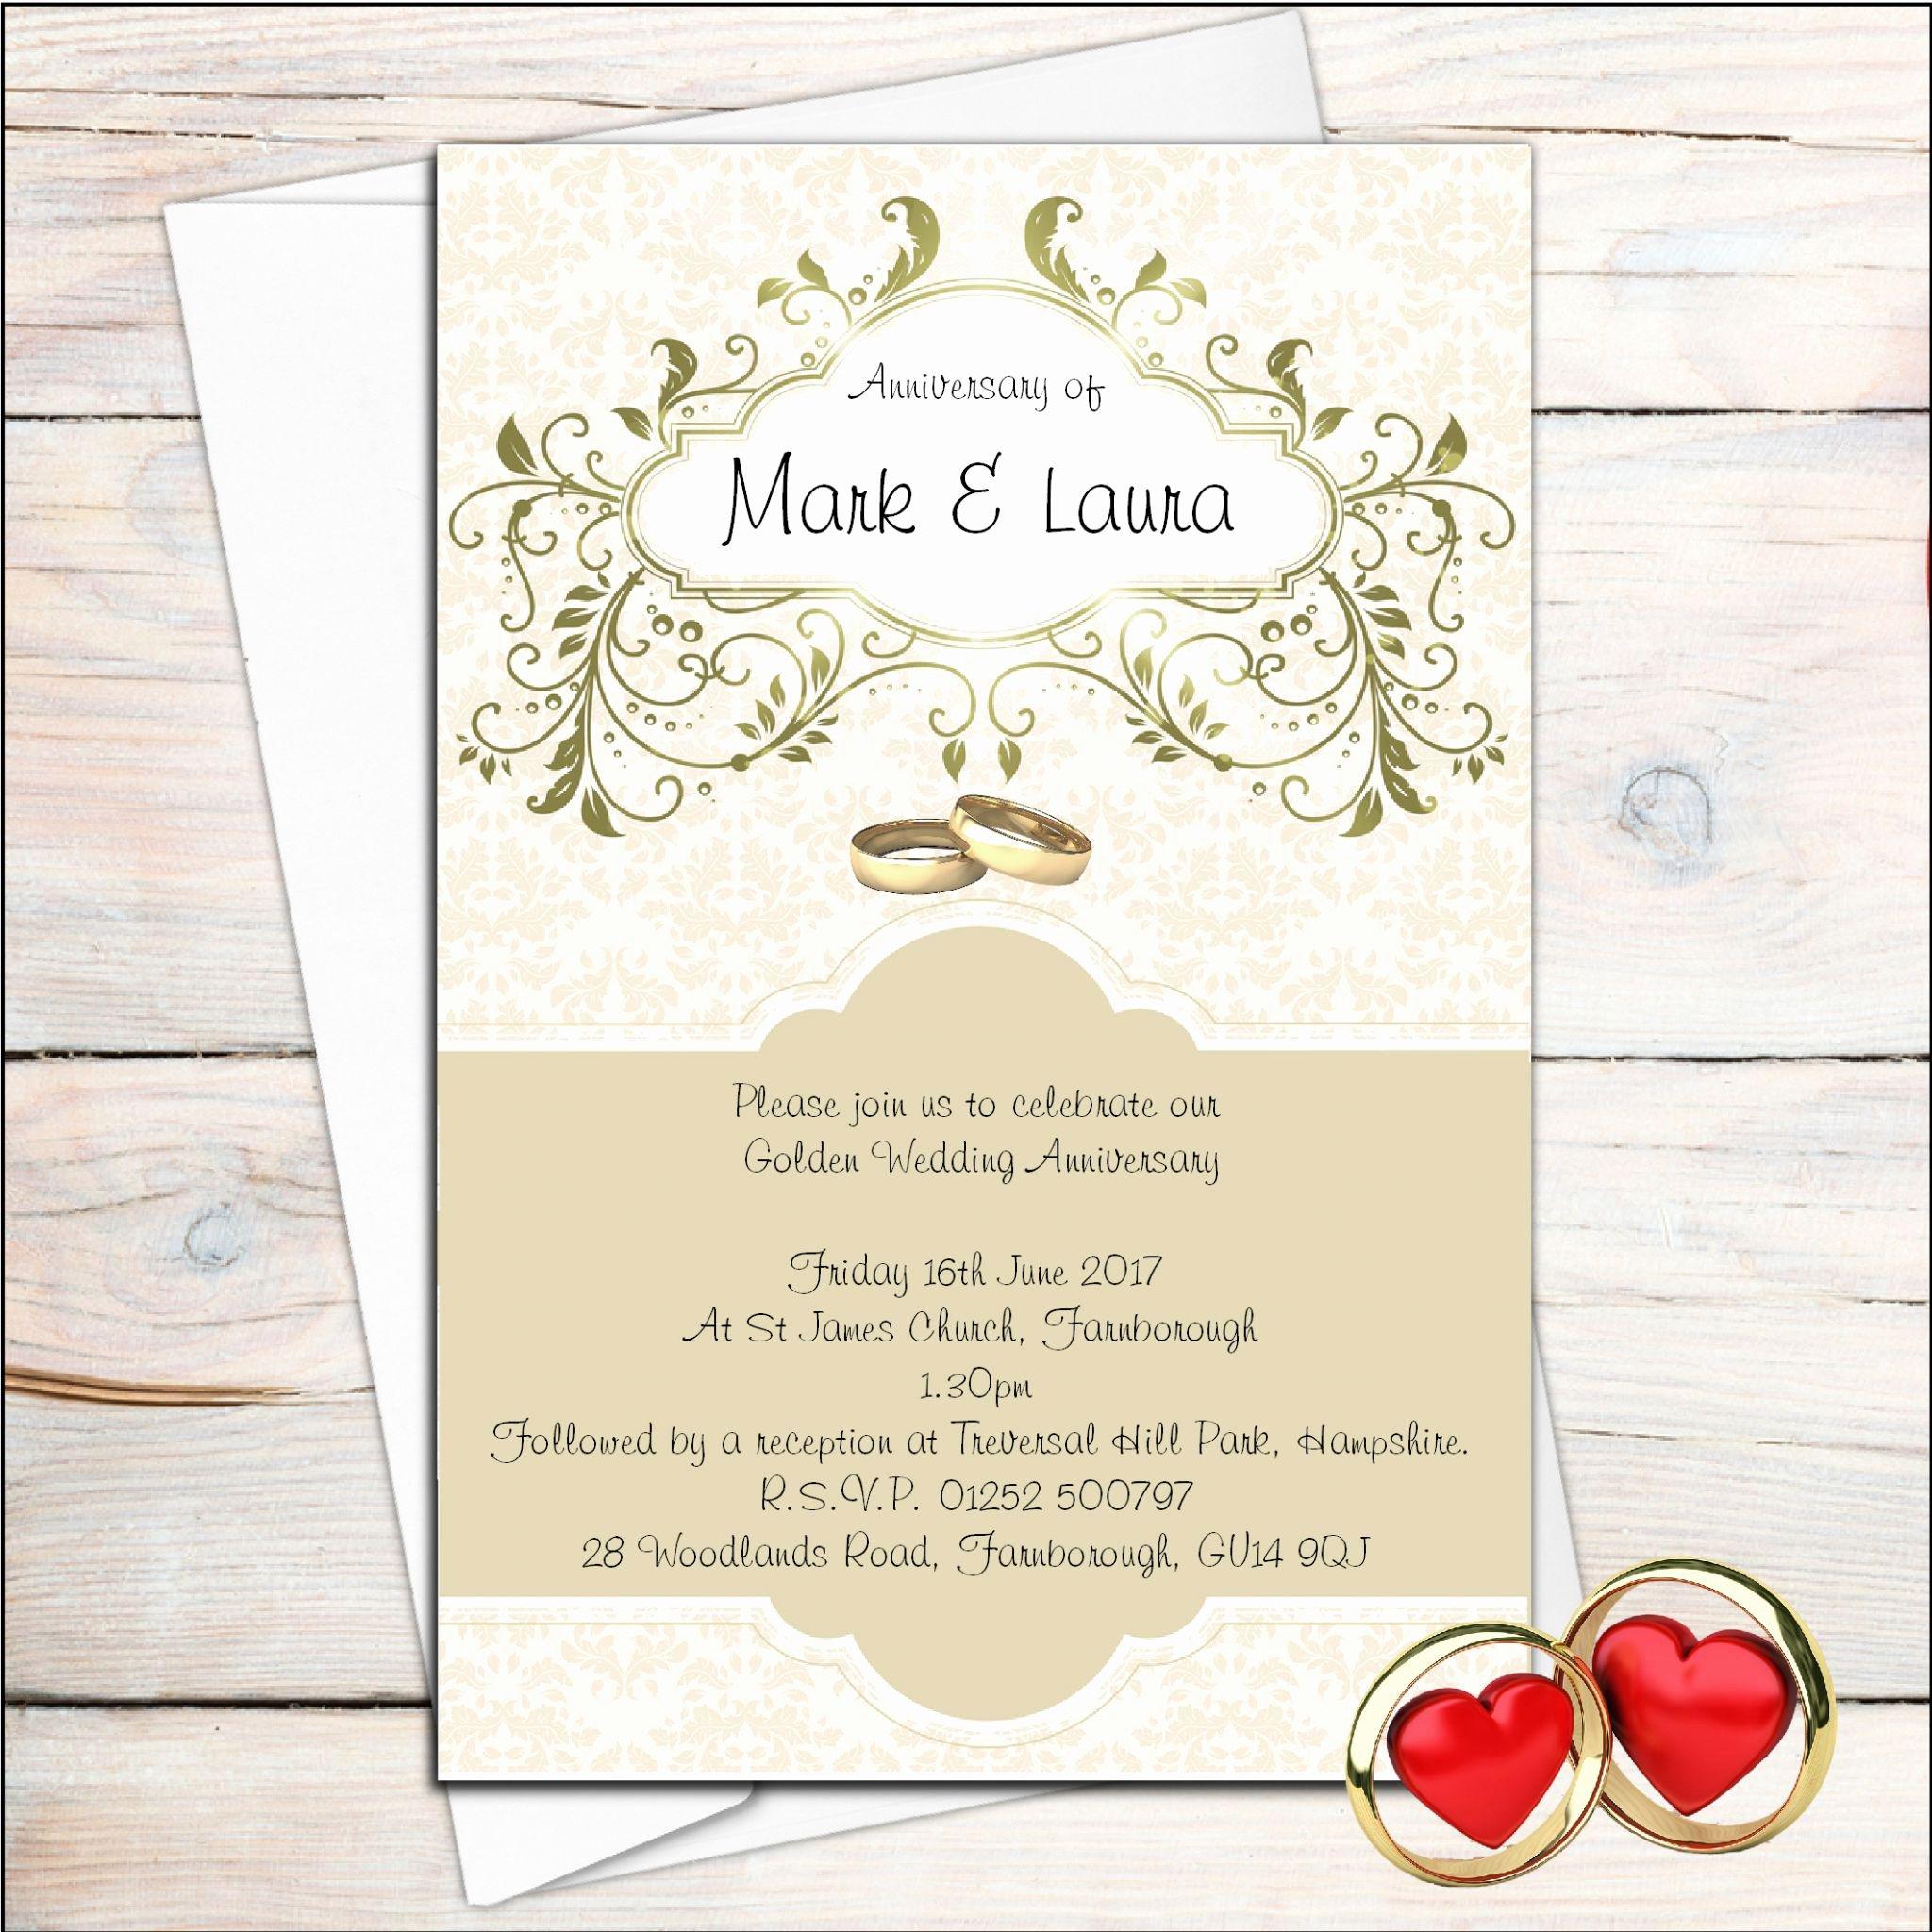 Golden Wedding Anniversary Invitations 50th Wedding